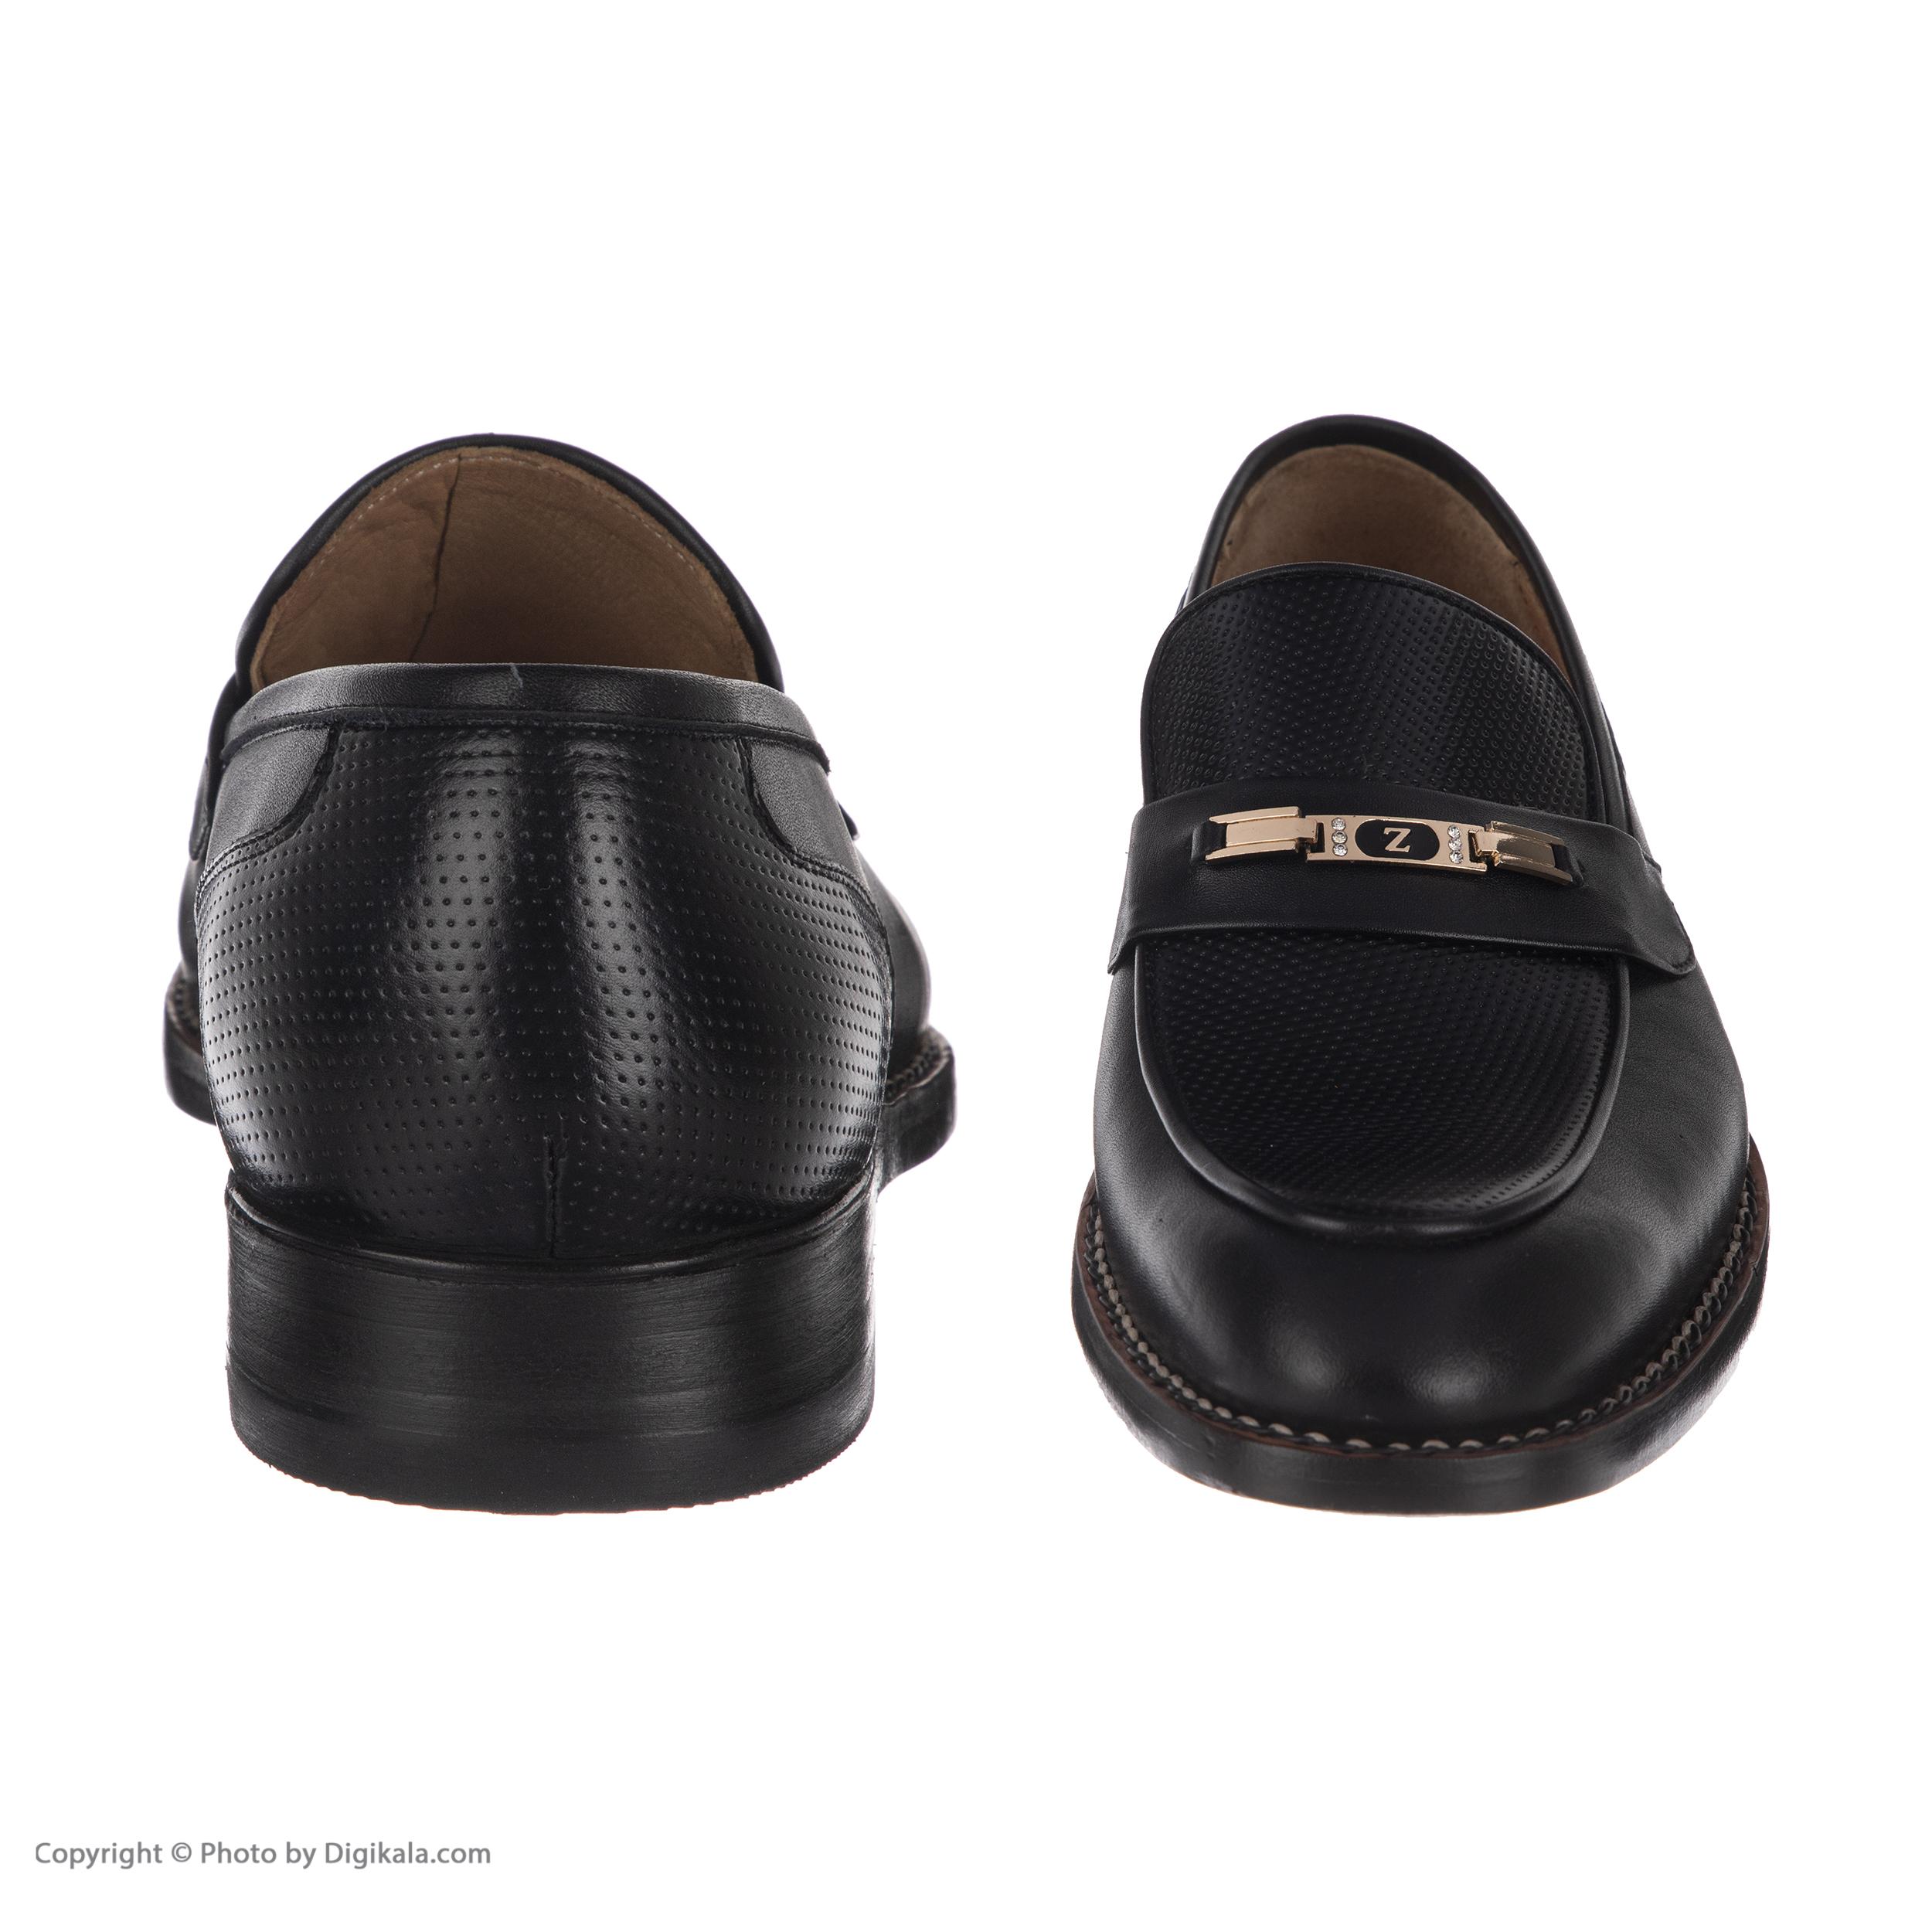 کفش مردانه نظری کد 403 -  - 3